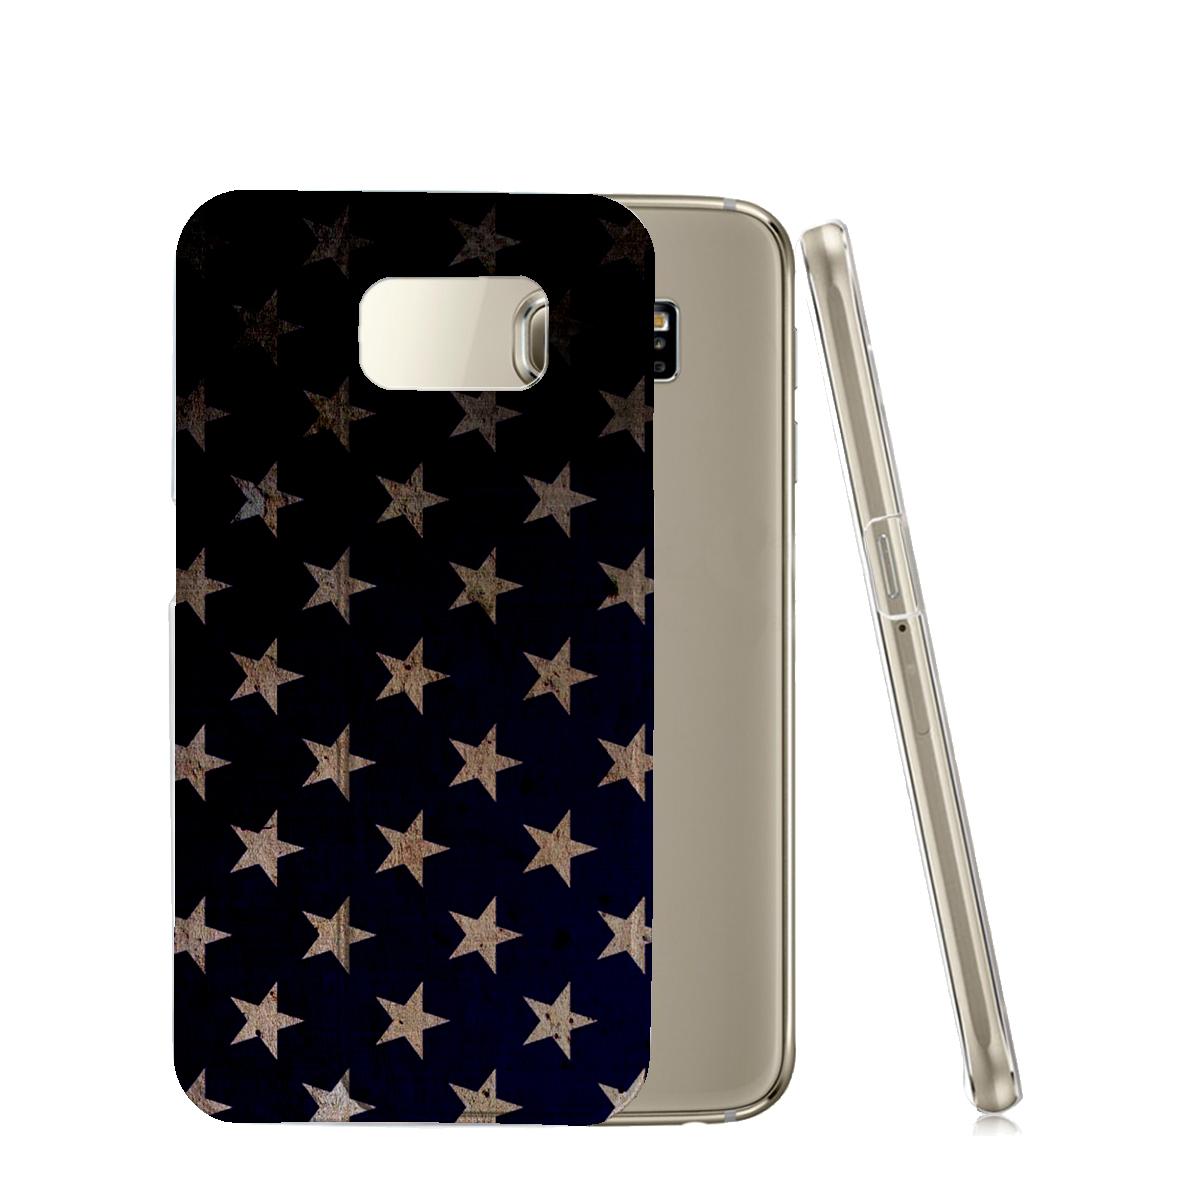 KuzmarK™ Samsung Galaxy S6 Edge Clear Cover Case - American Flag Stars